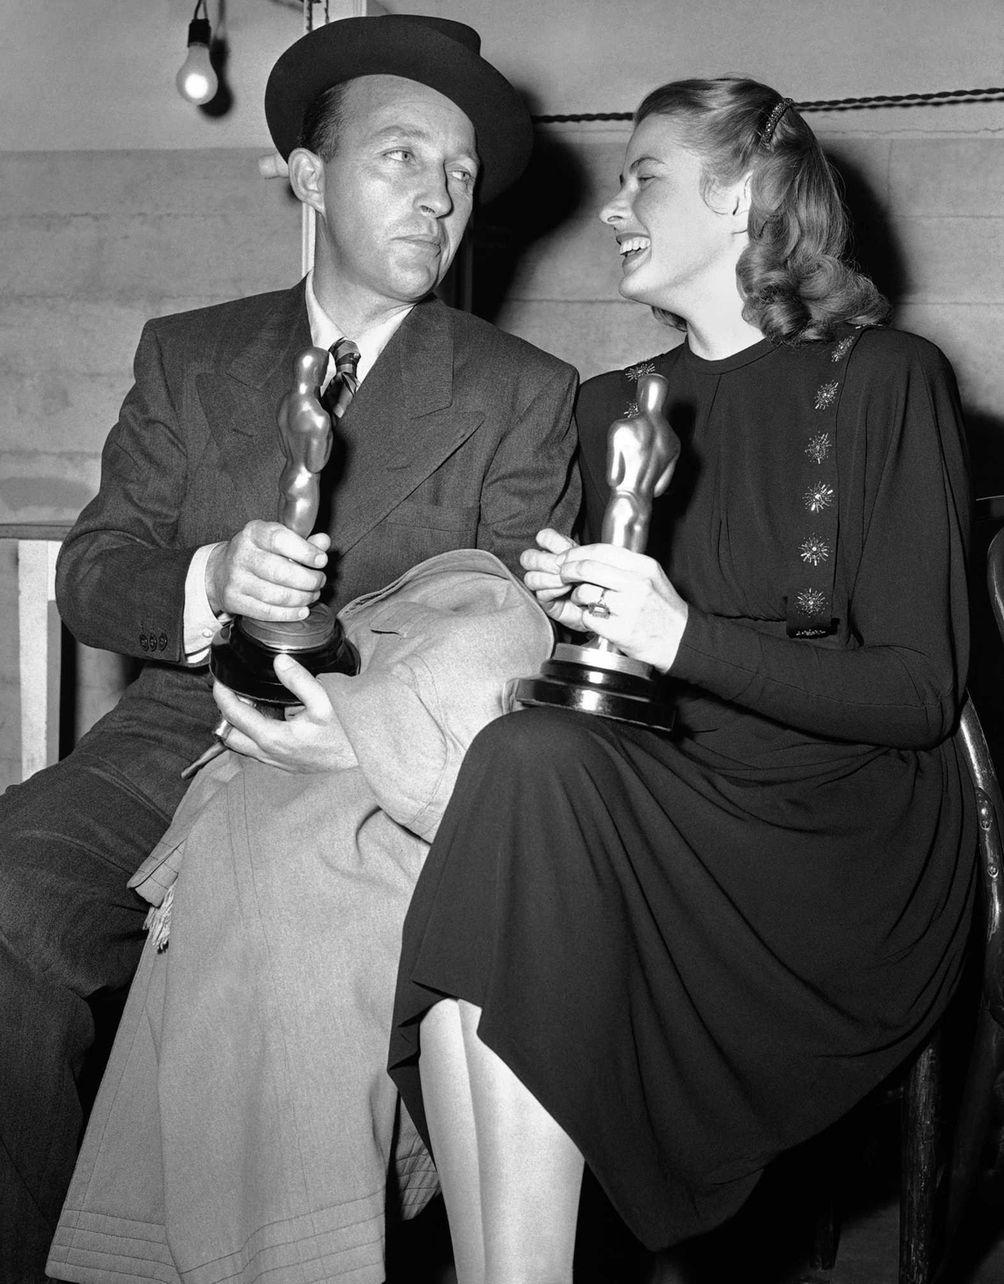 Bing Crosby and Ingrid Bergman, holding the Oscar